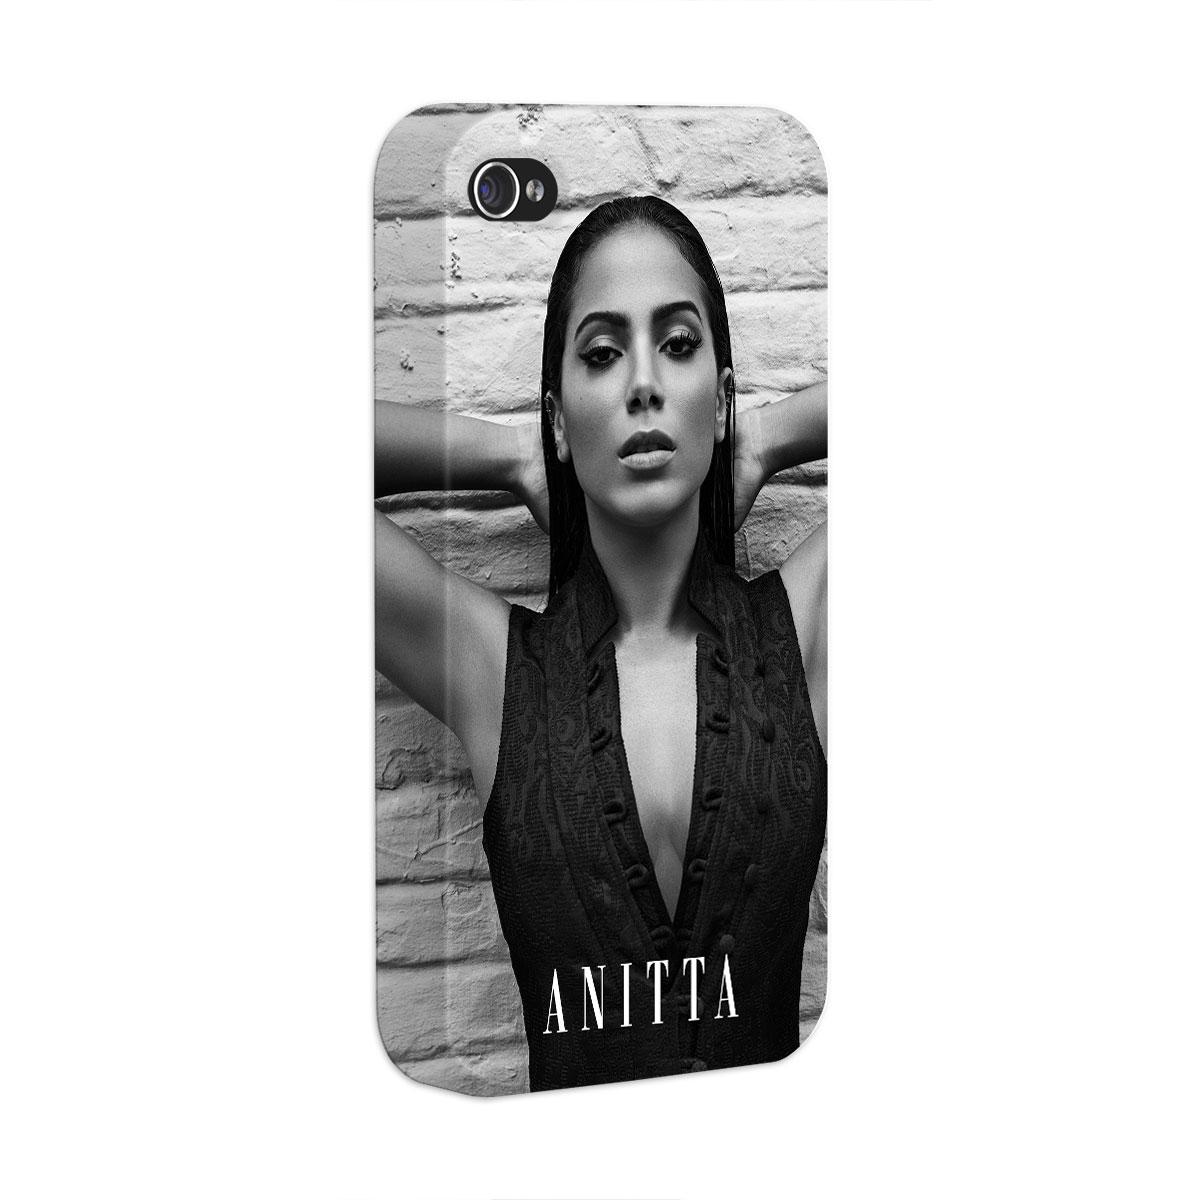 Capa para iPhone 4/4S Anitta P&B